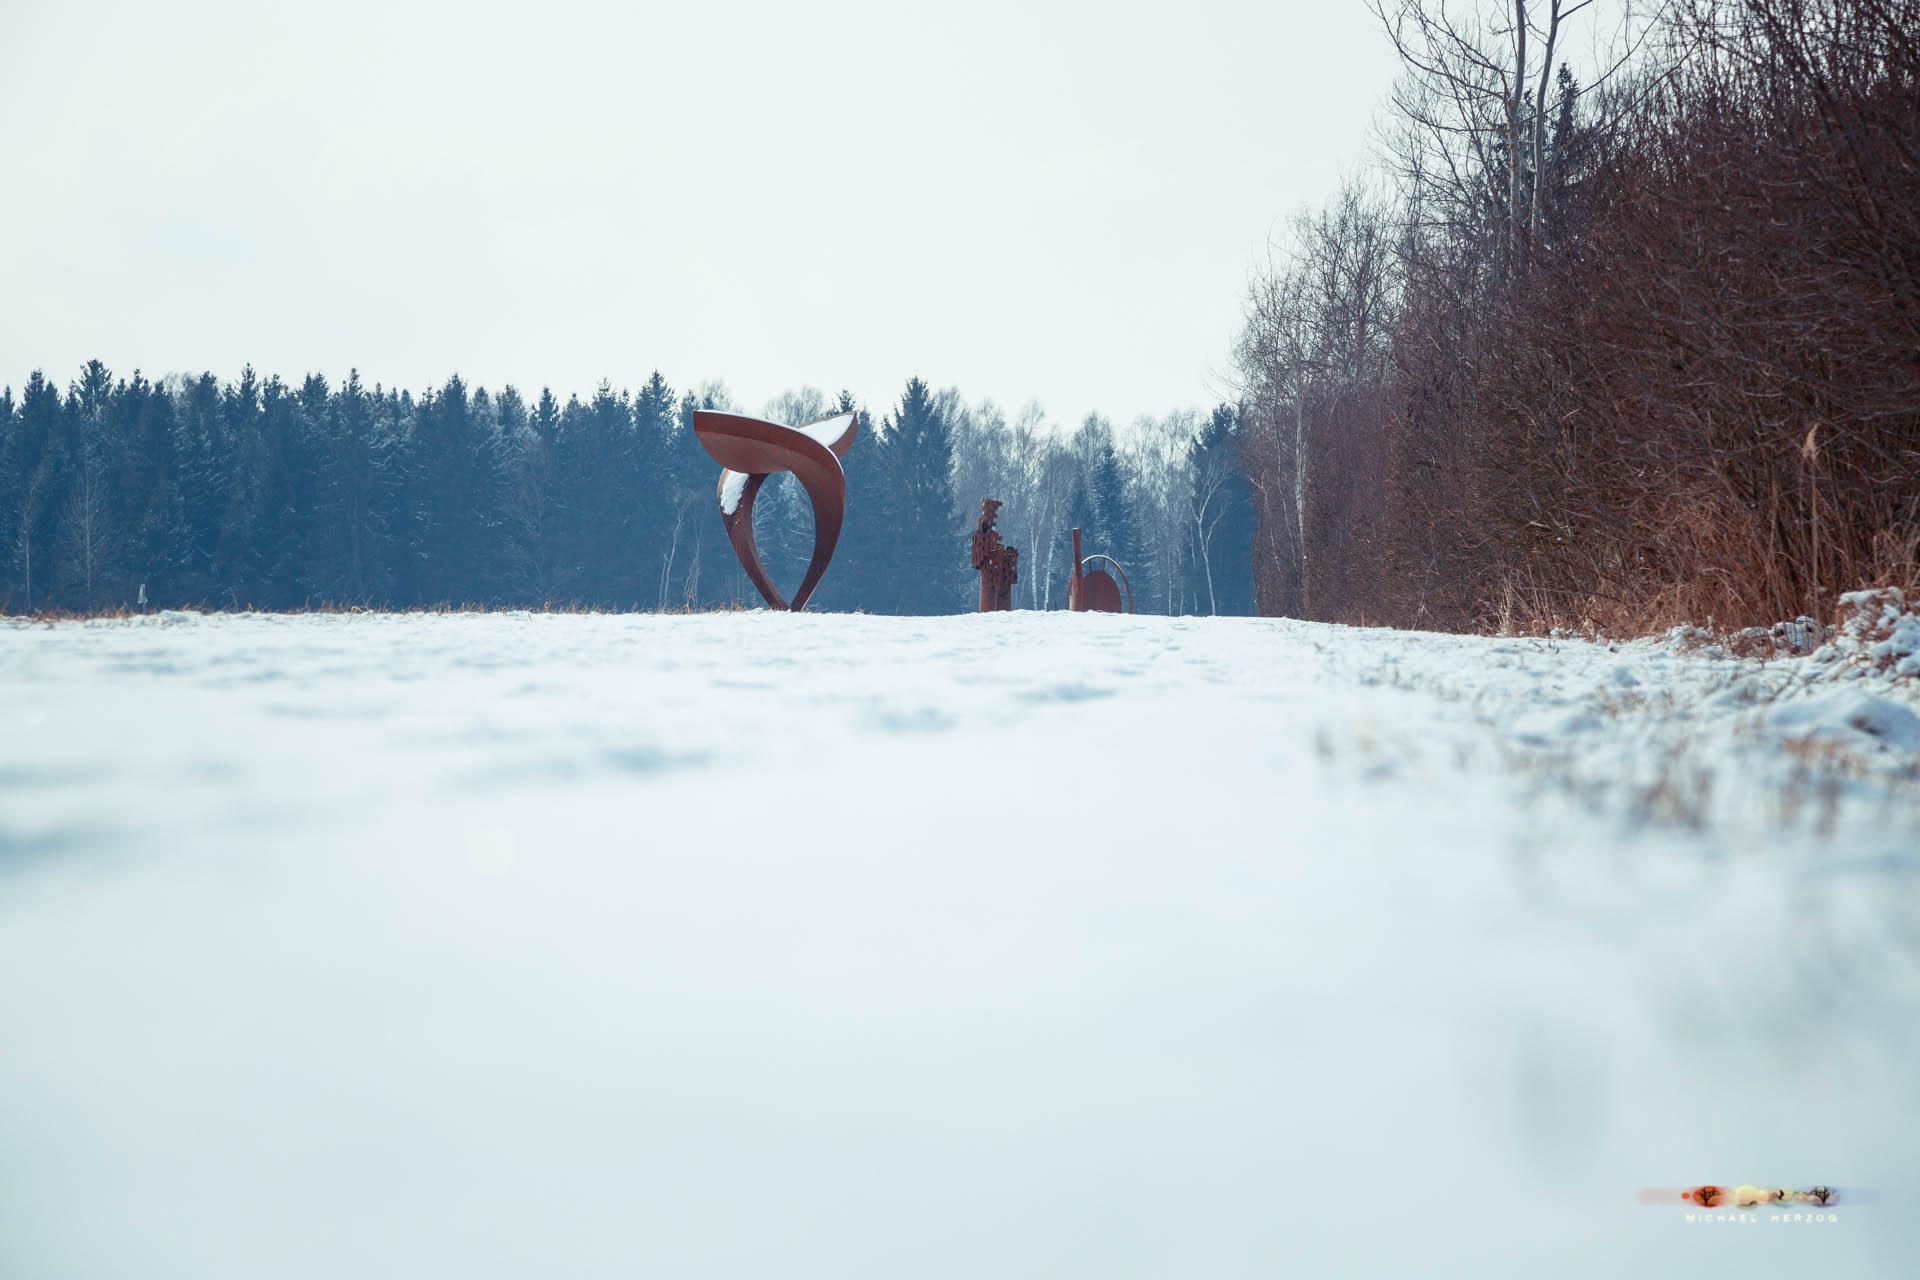 Weidmoos_SibirischeKälte_Frühling2018_MichaelHerzog-2317.jpg